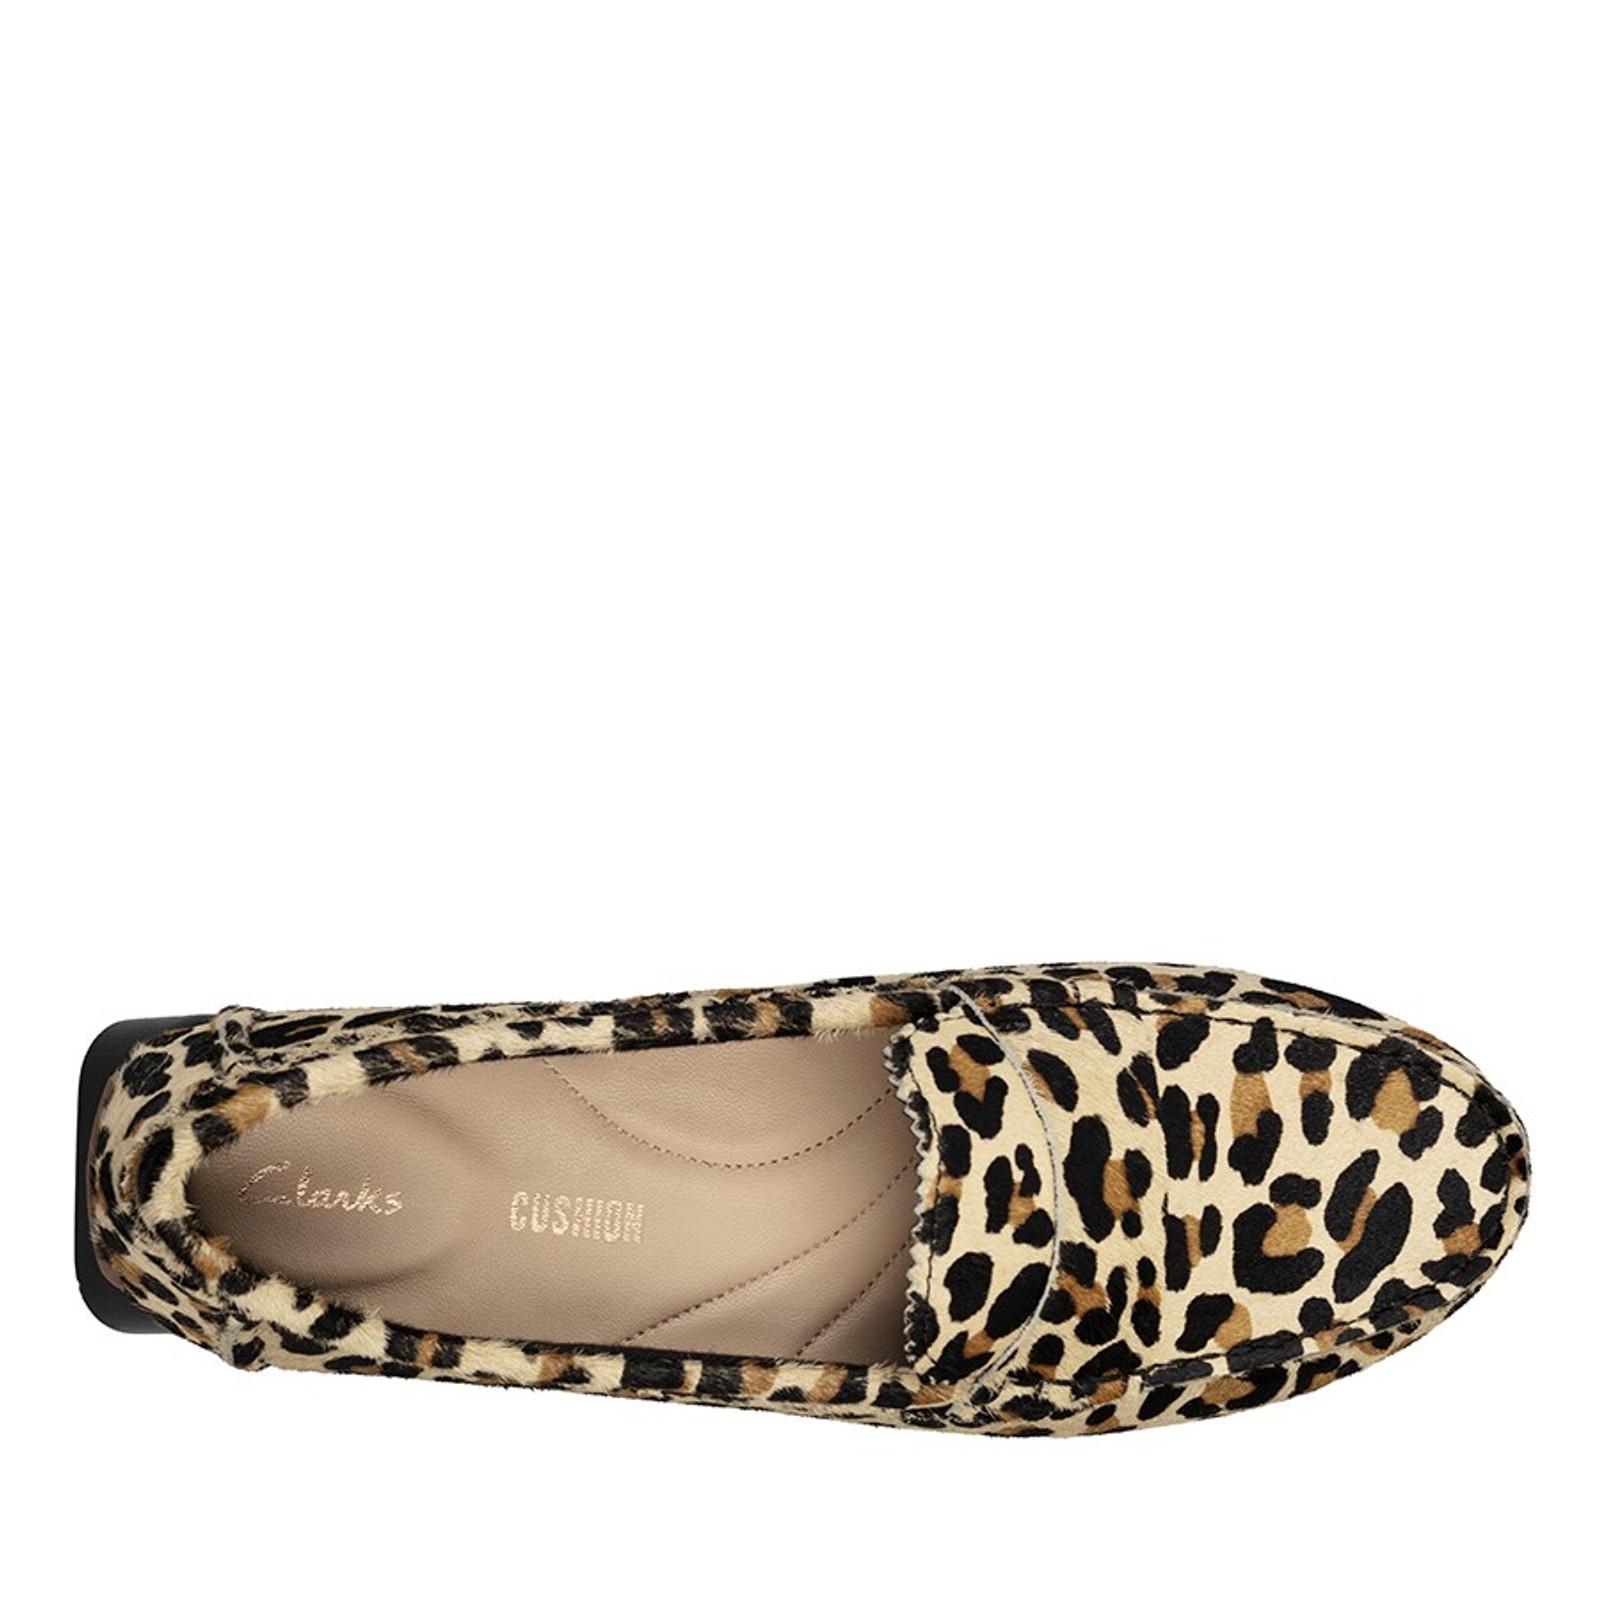 Clarks Womens C MOCC Leopard